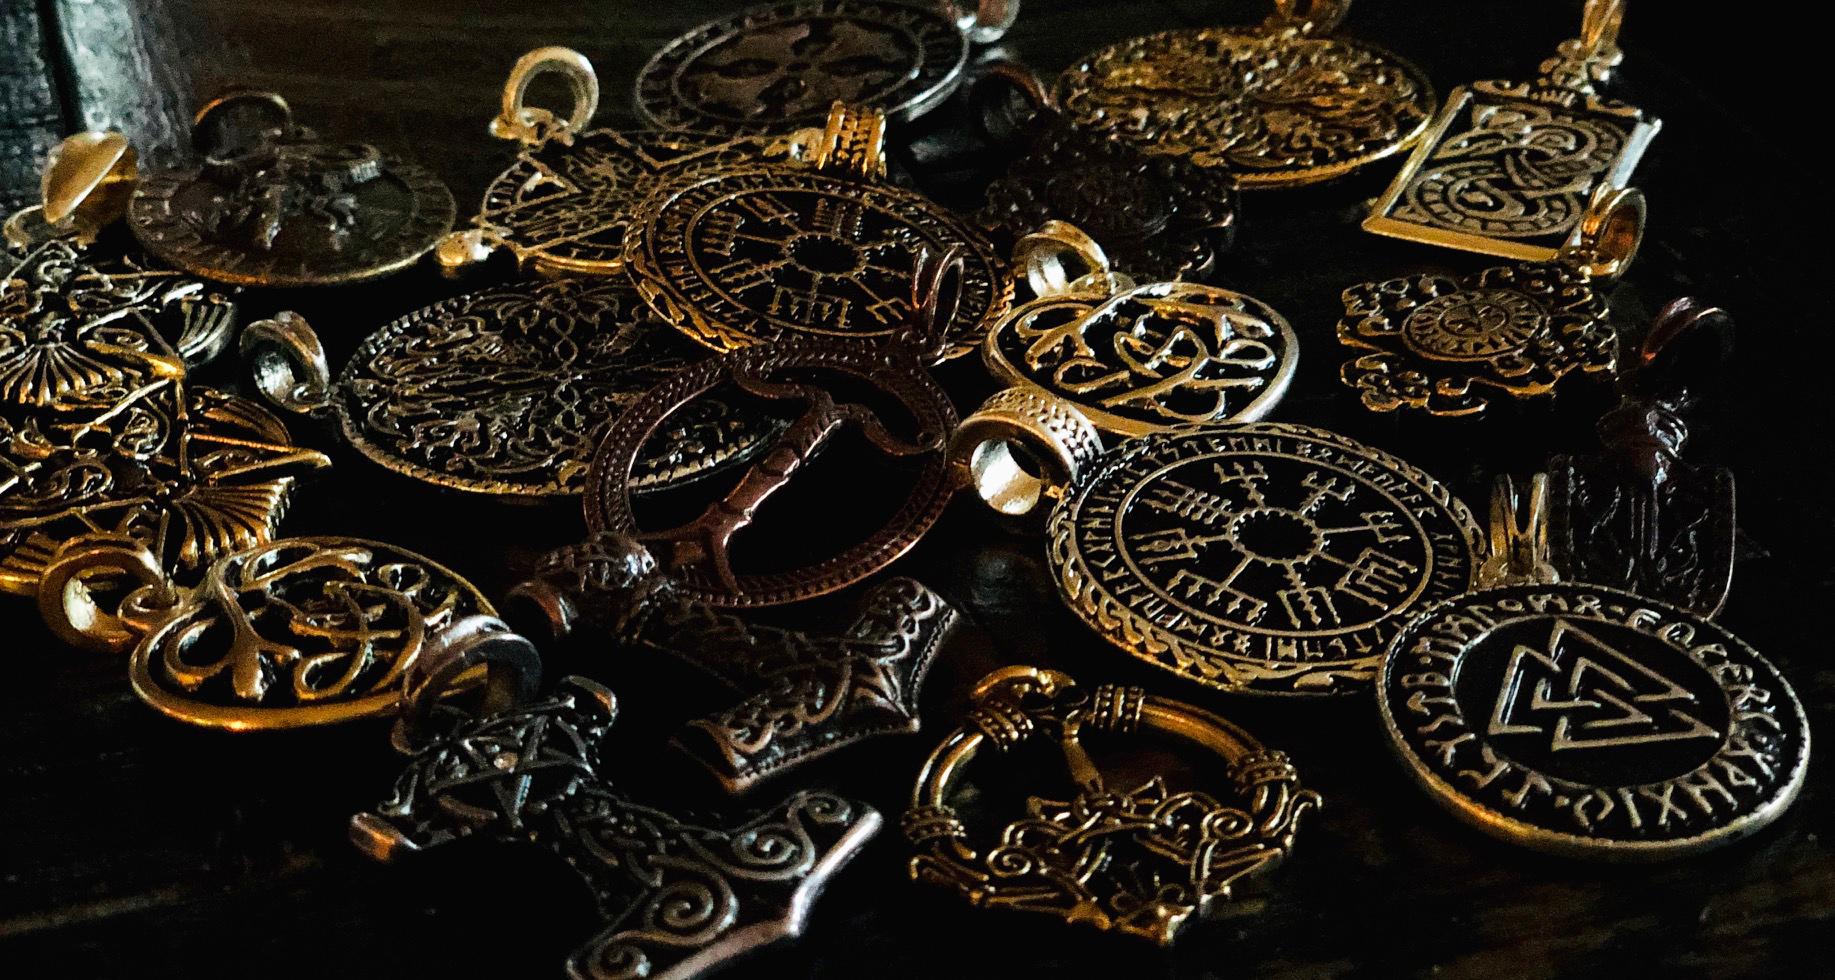 norse-viking-jewelry-pagan.jpg